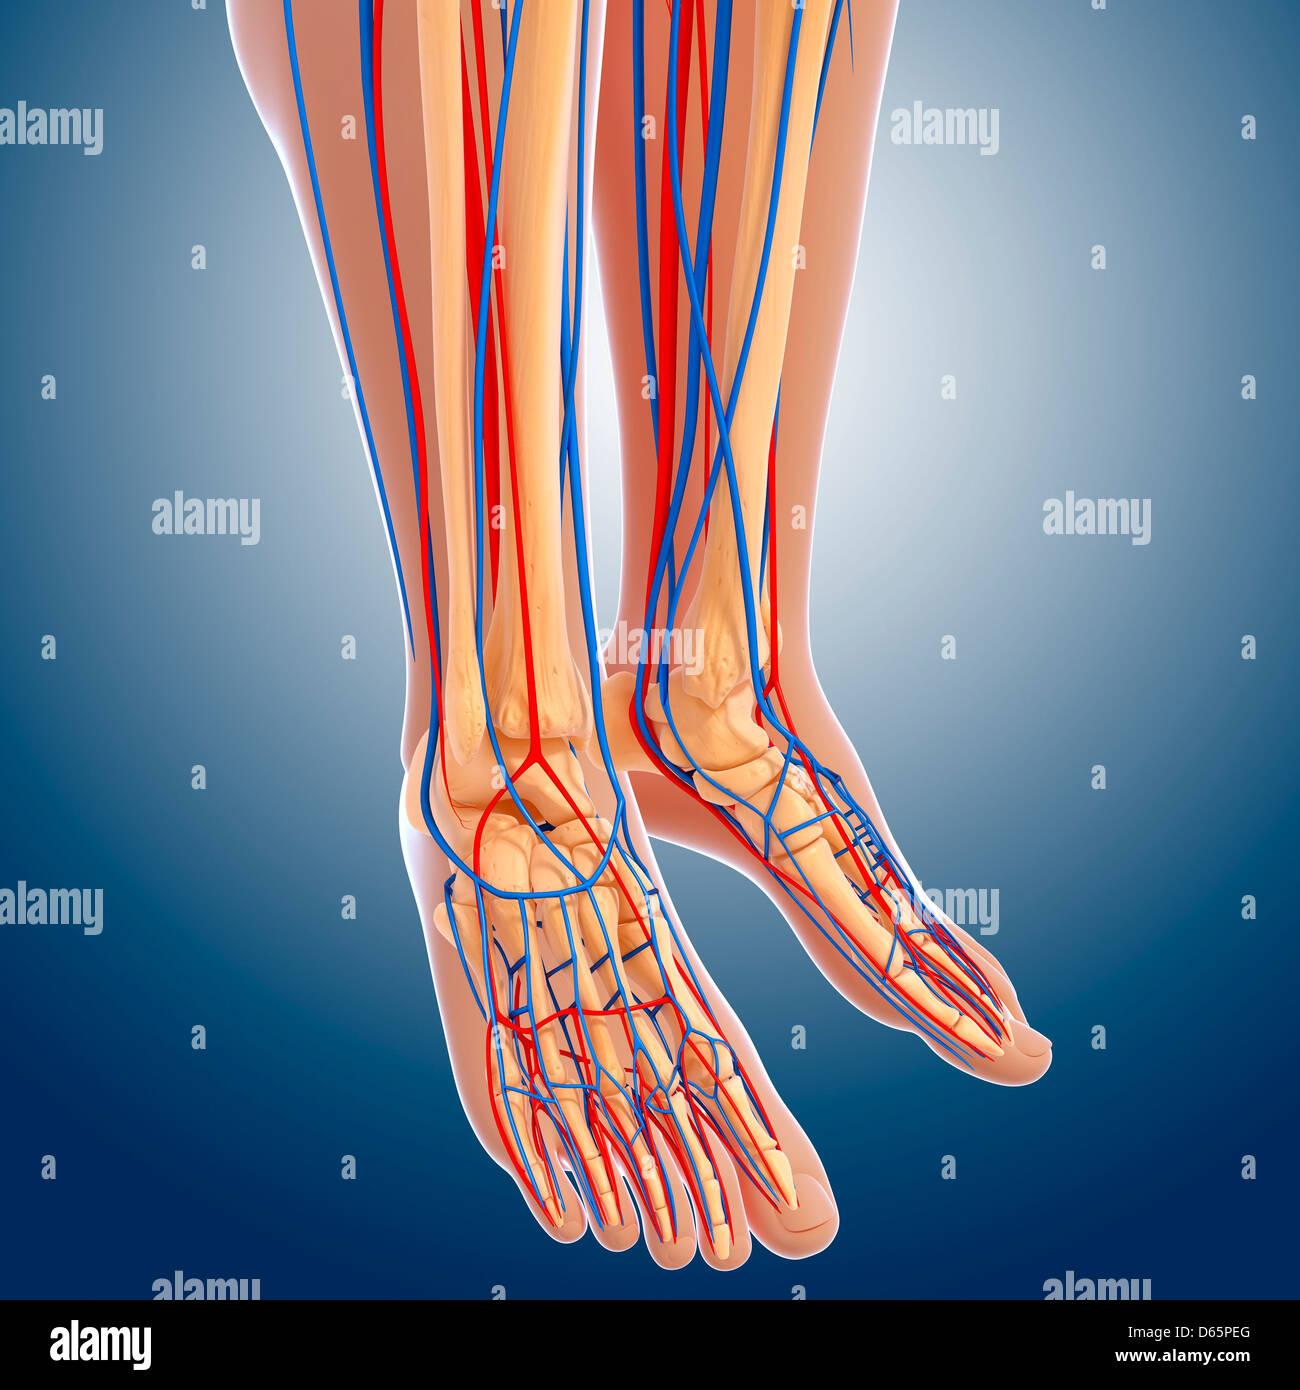 Lower Leg Anatomy Artwork Stock Photo 55446456 Alamy